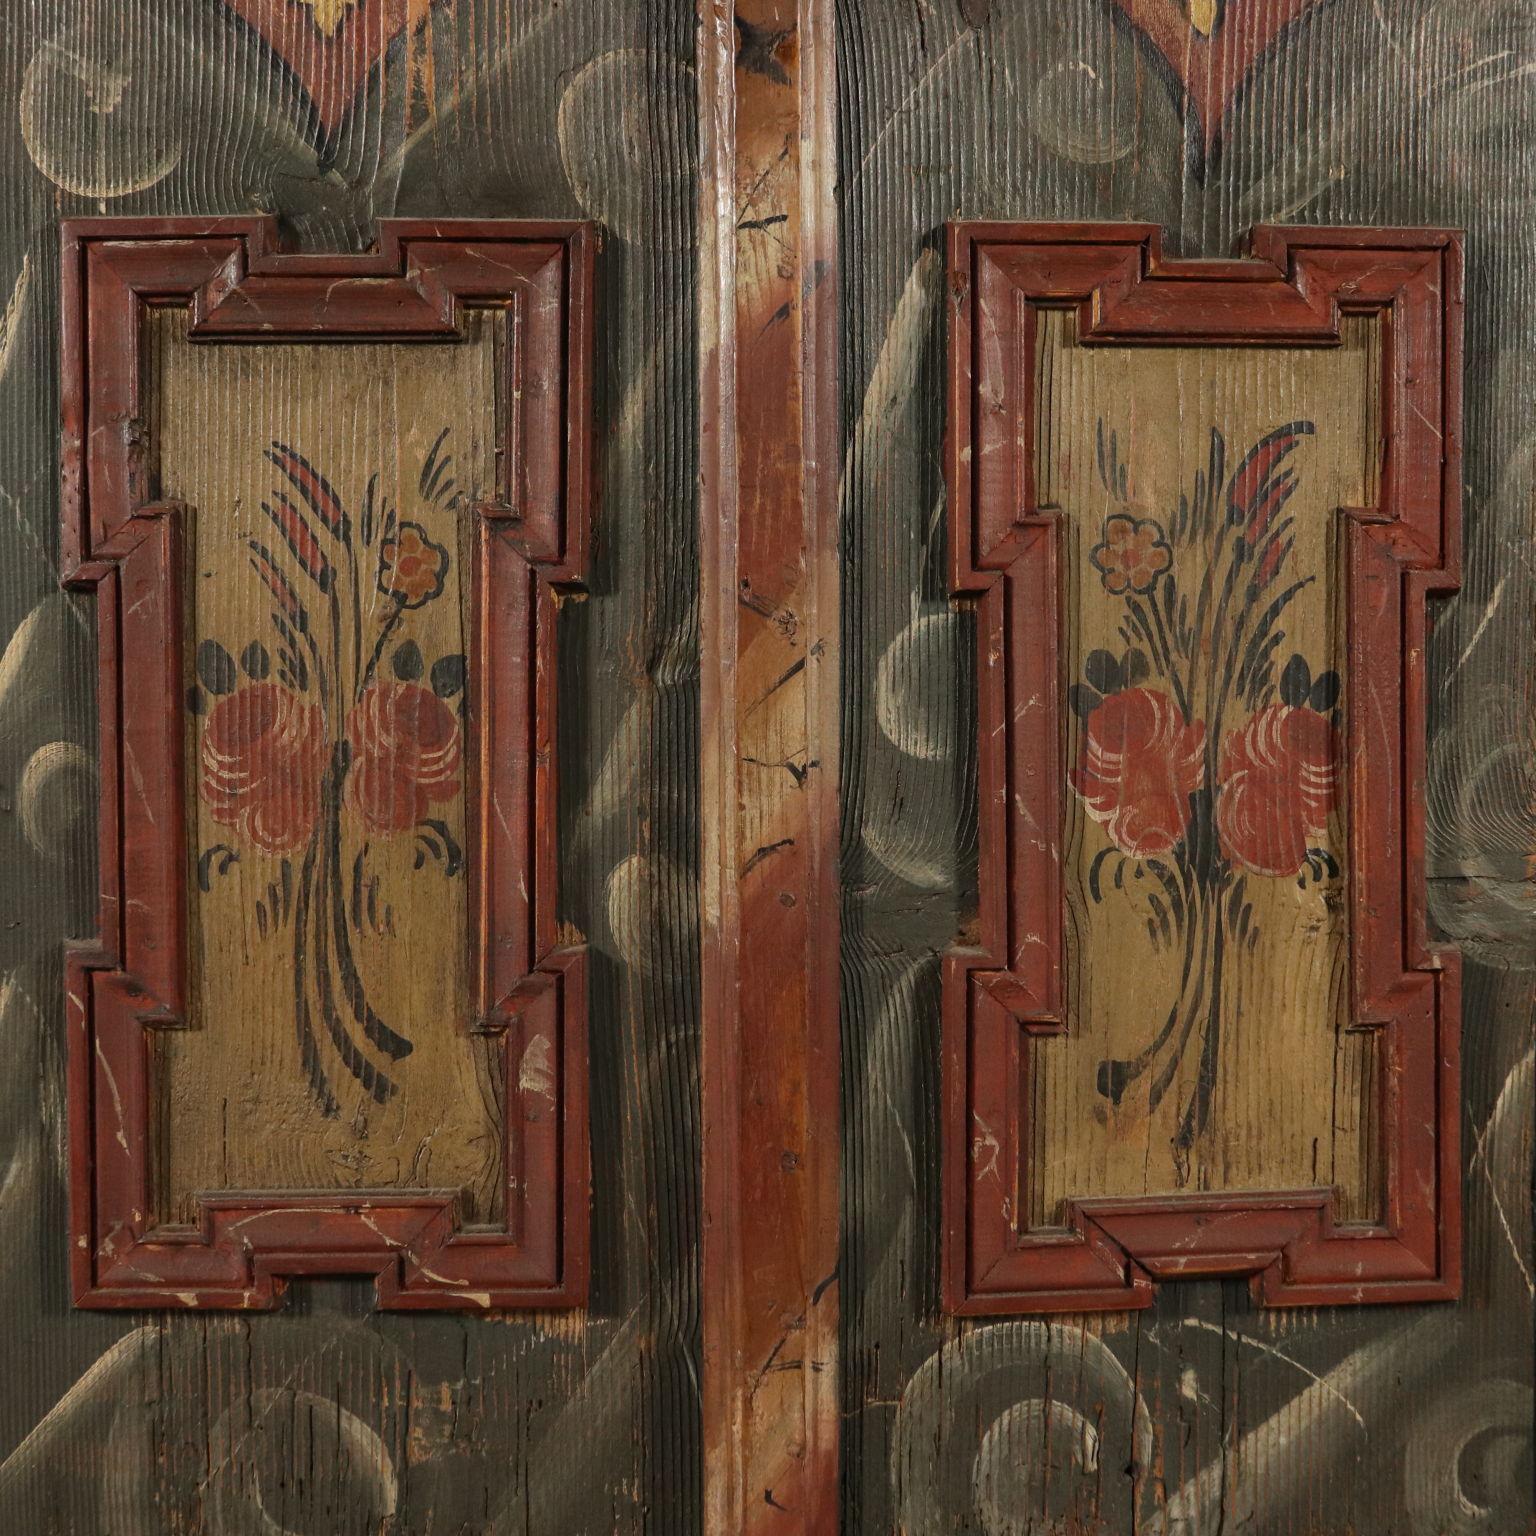 Armadi Tirolesi Dipinti armadio dipinto tirolese - armadi - antiquariato